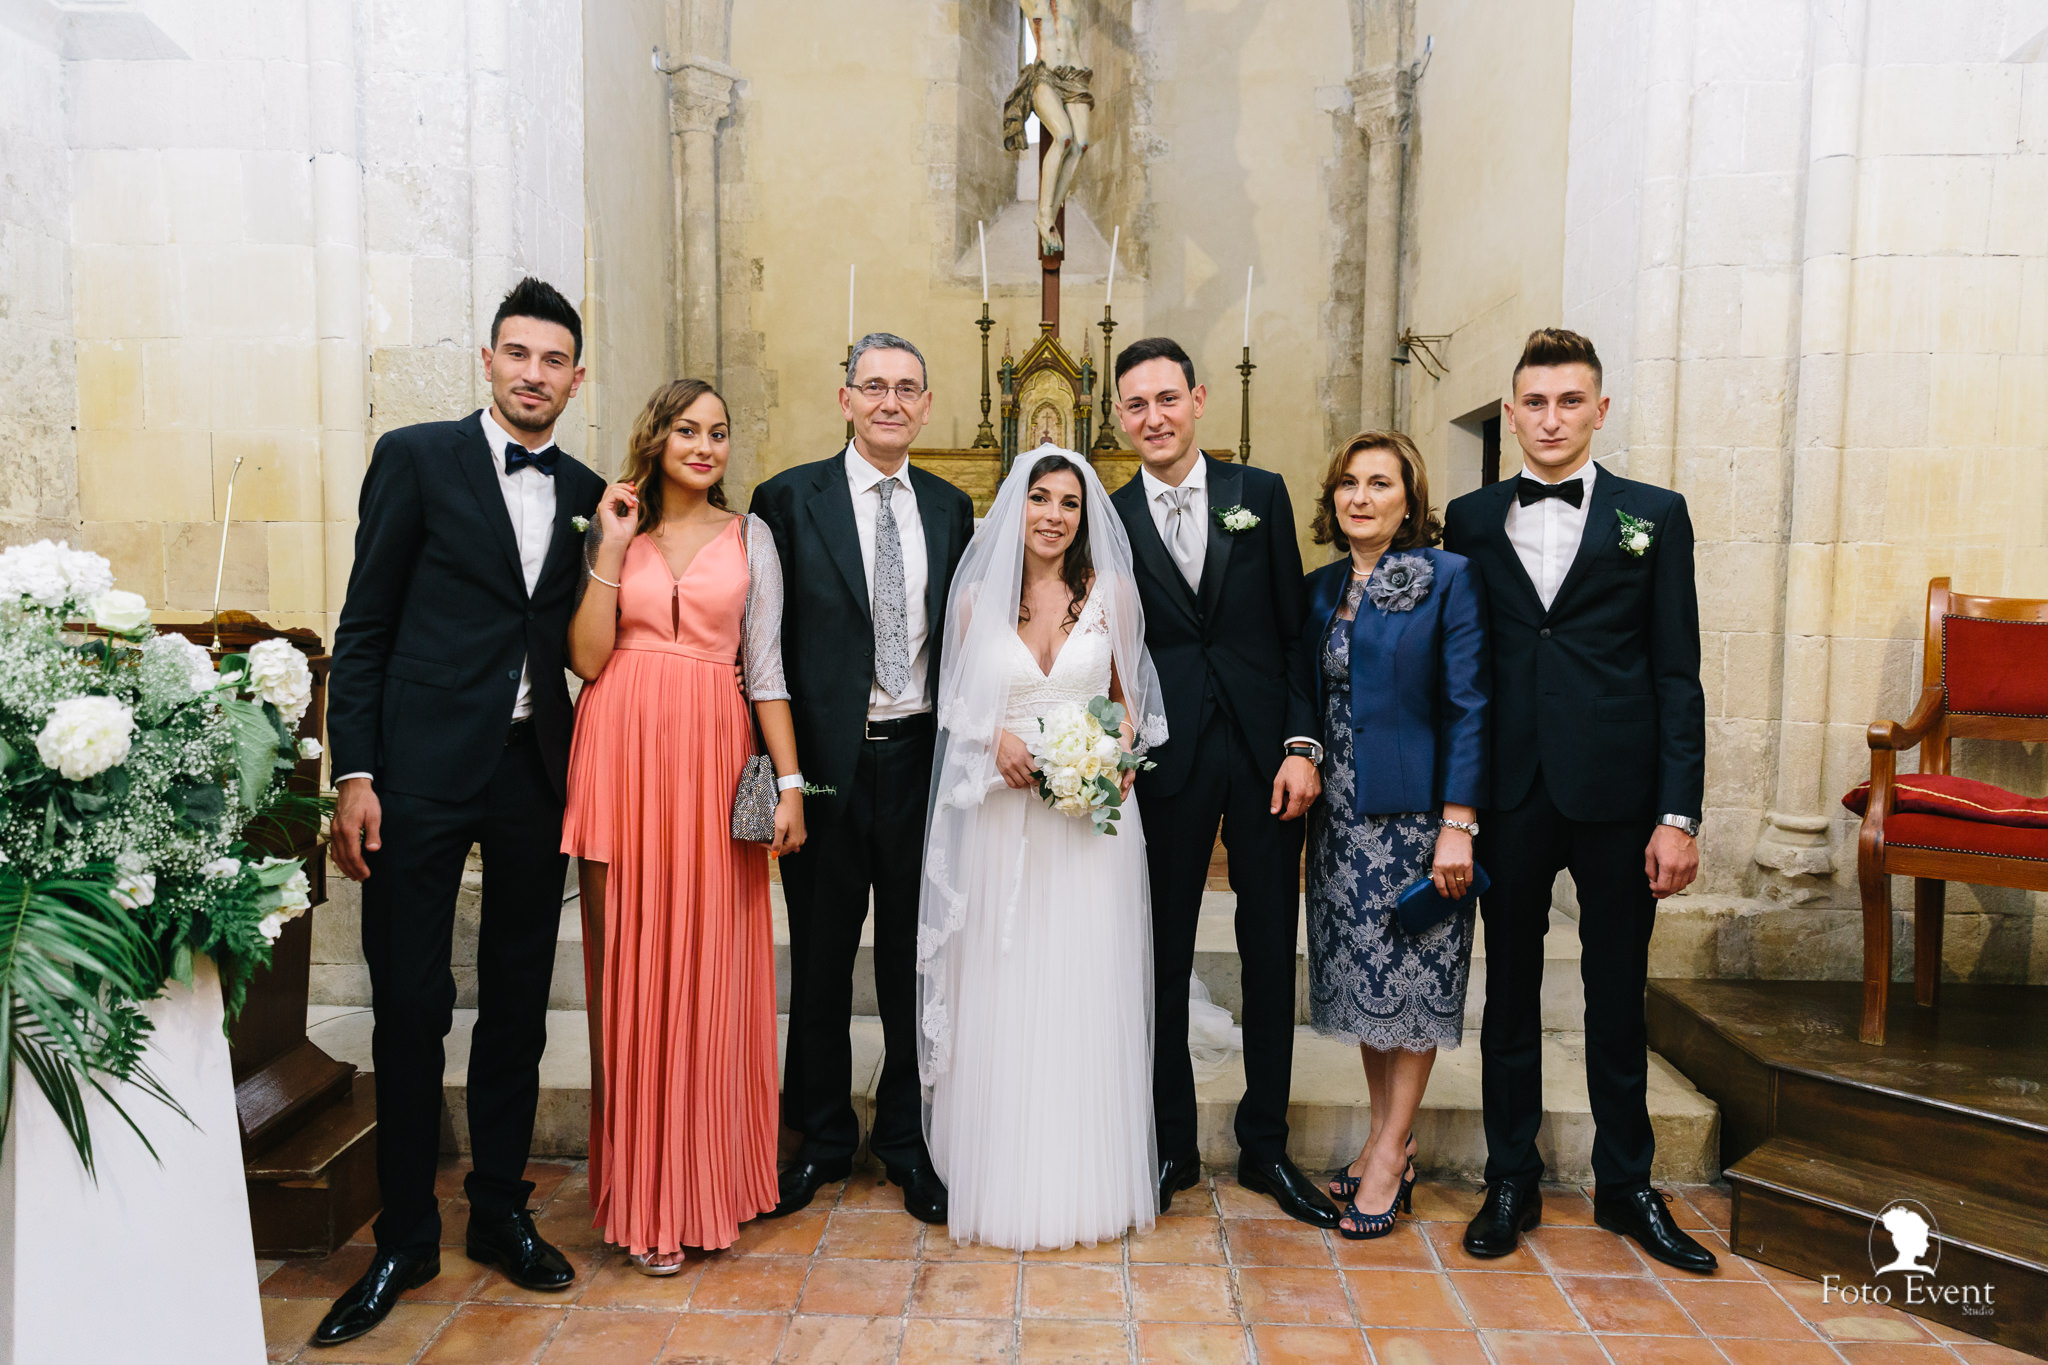 028-2019-08-23-Matrimonio-Lucia-e-Rosario-Scopelliti-5DE-1458